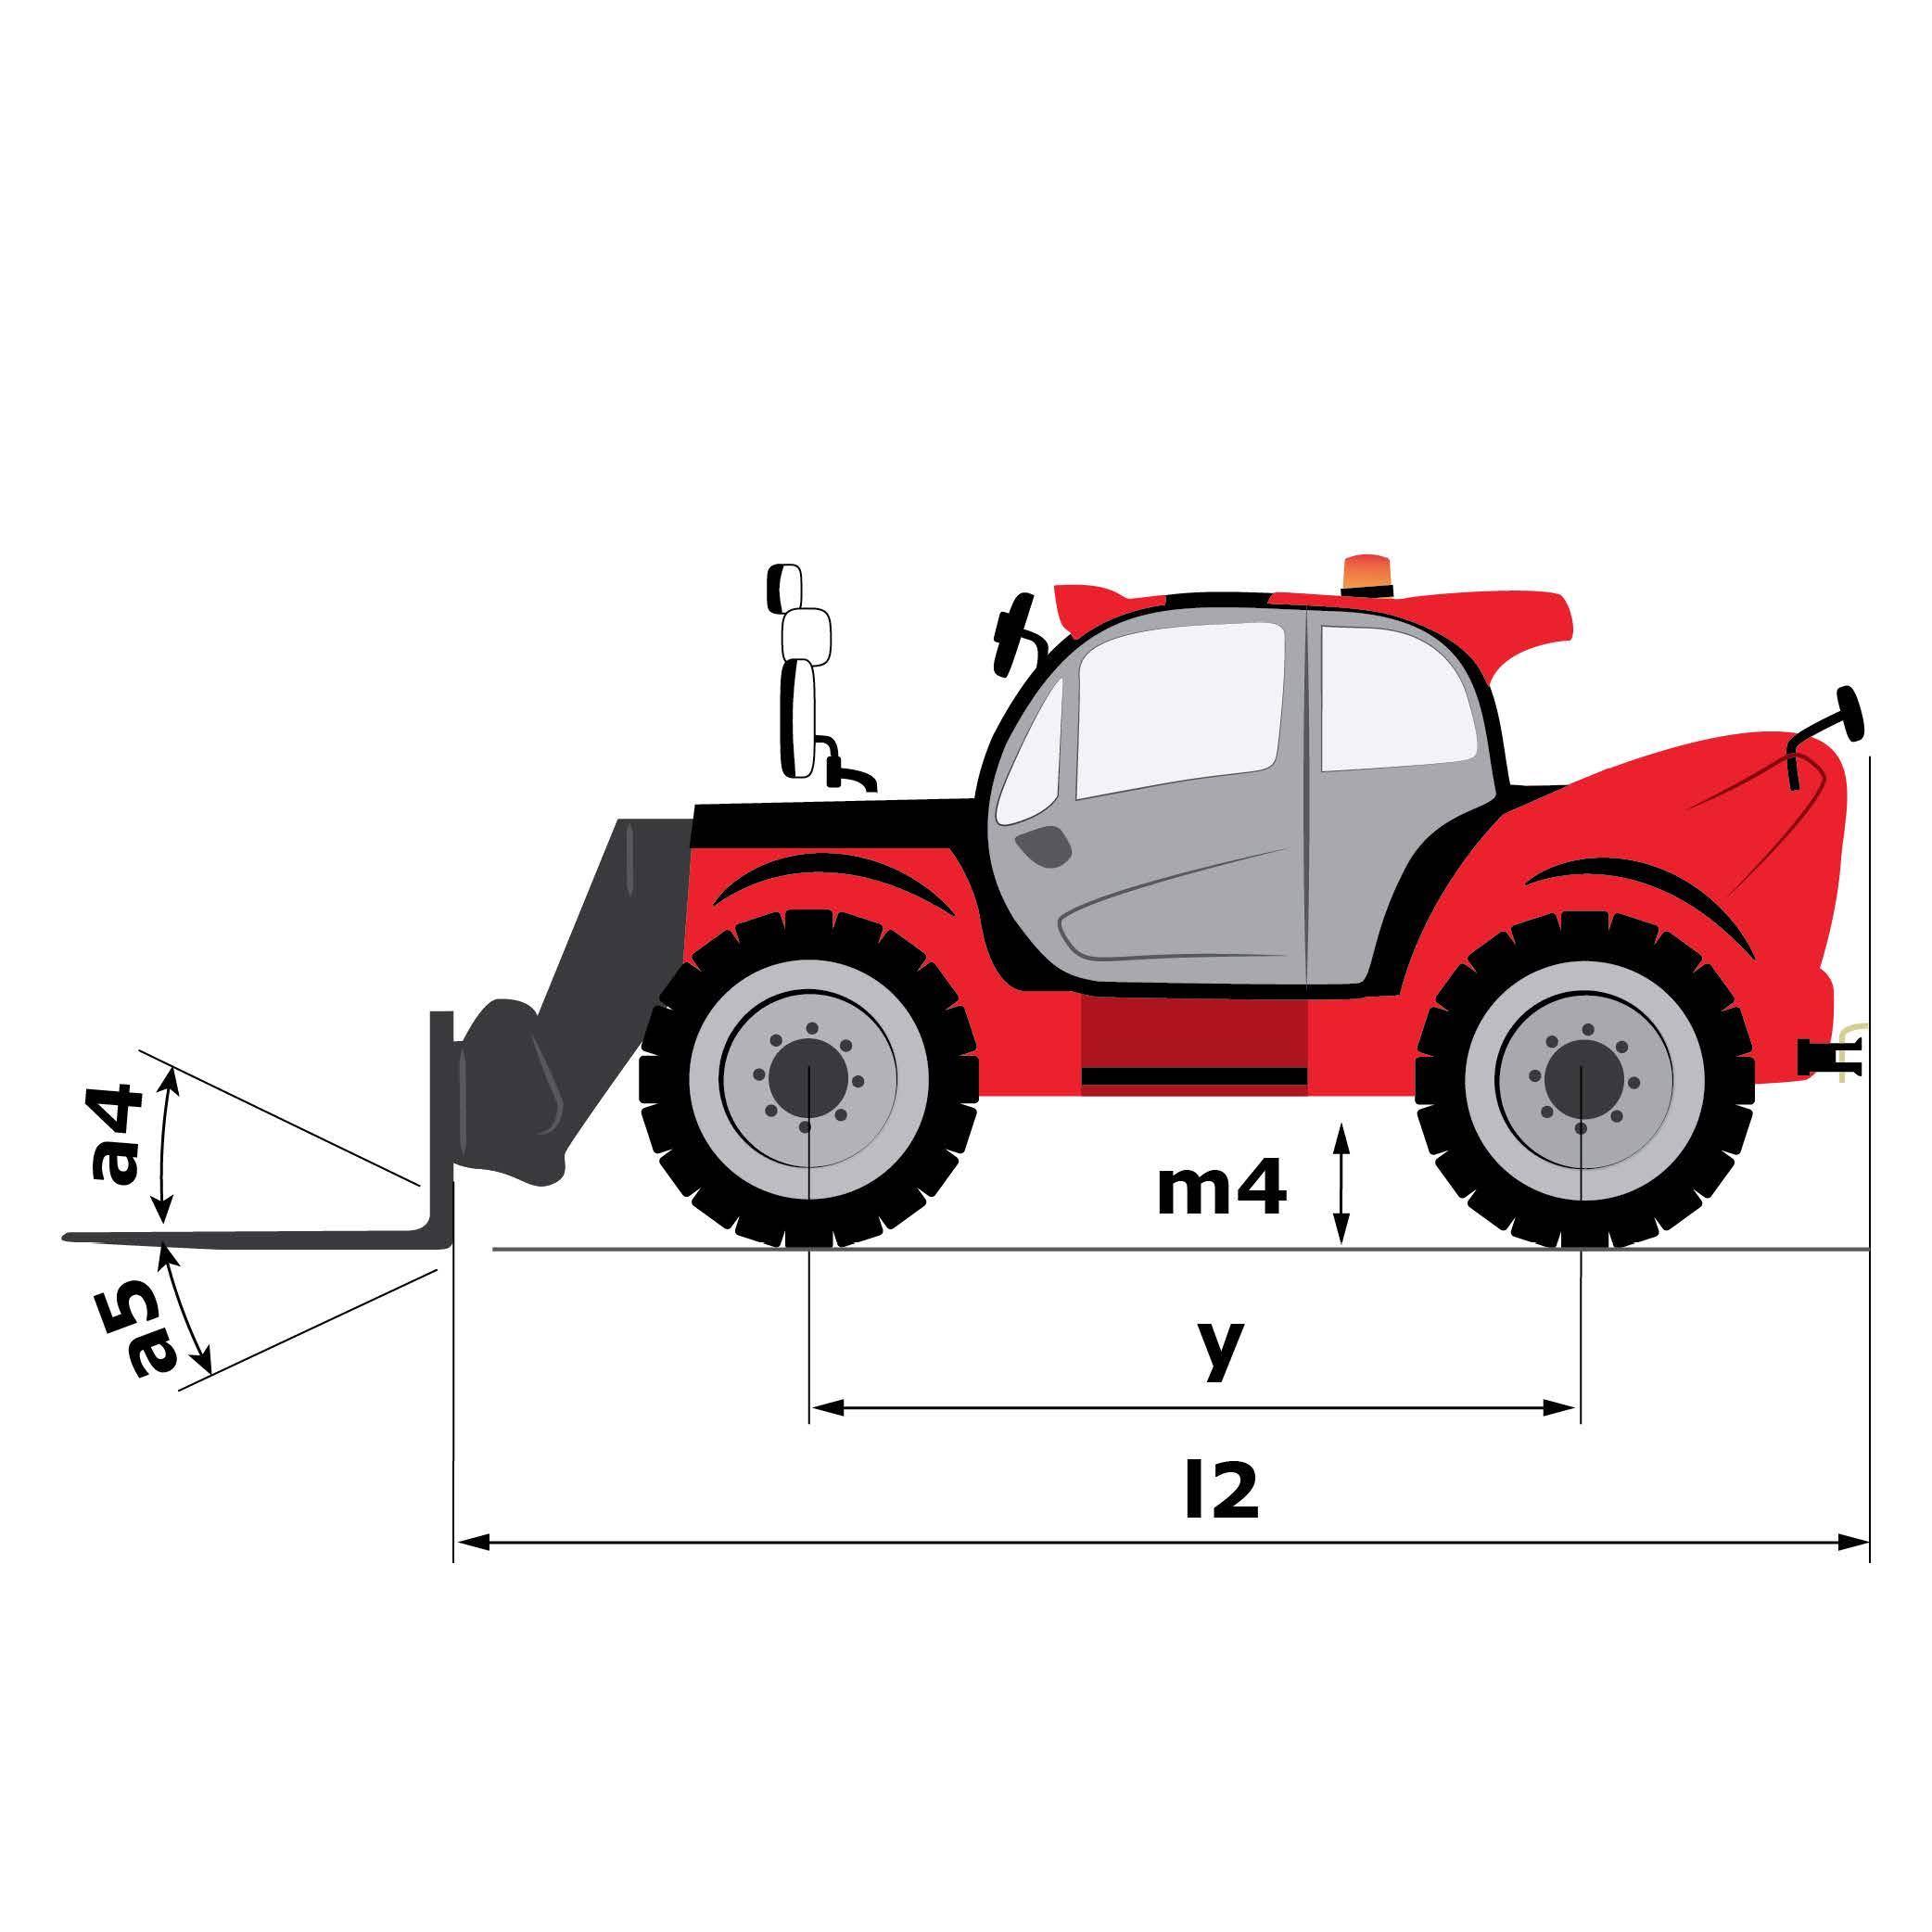 mxt-840-p-en-metric